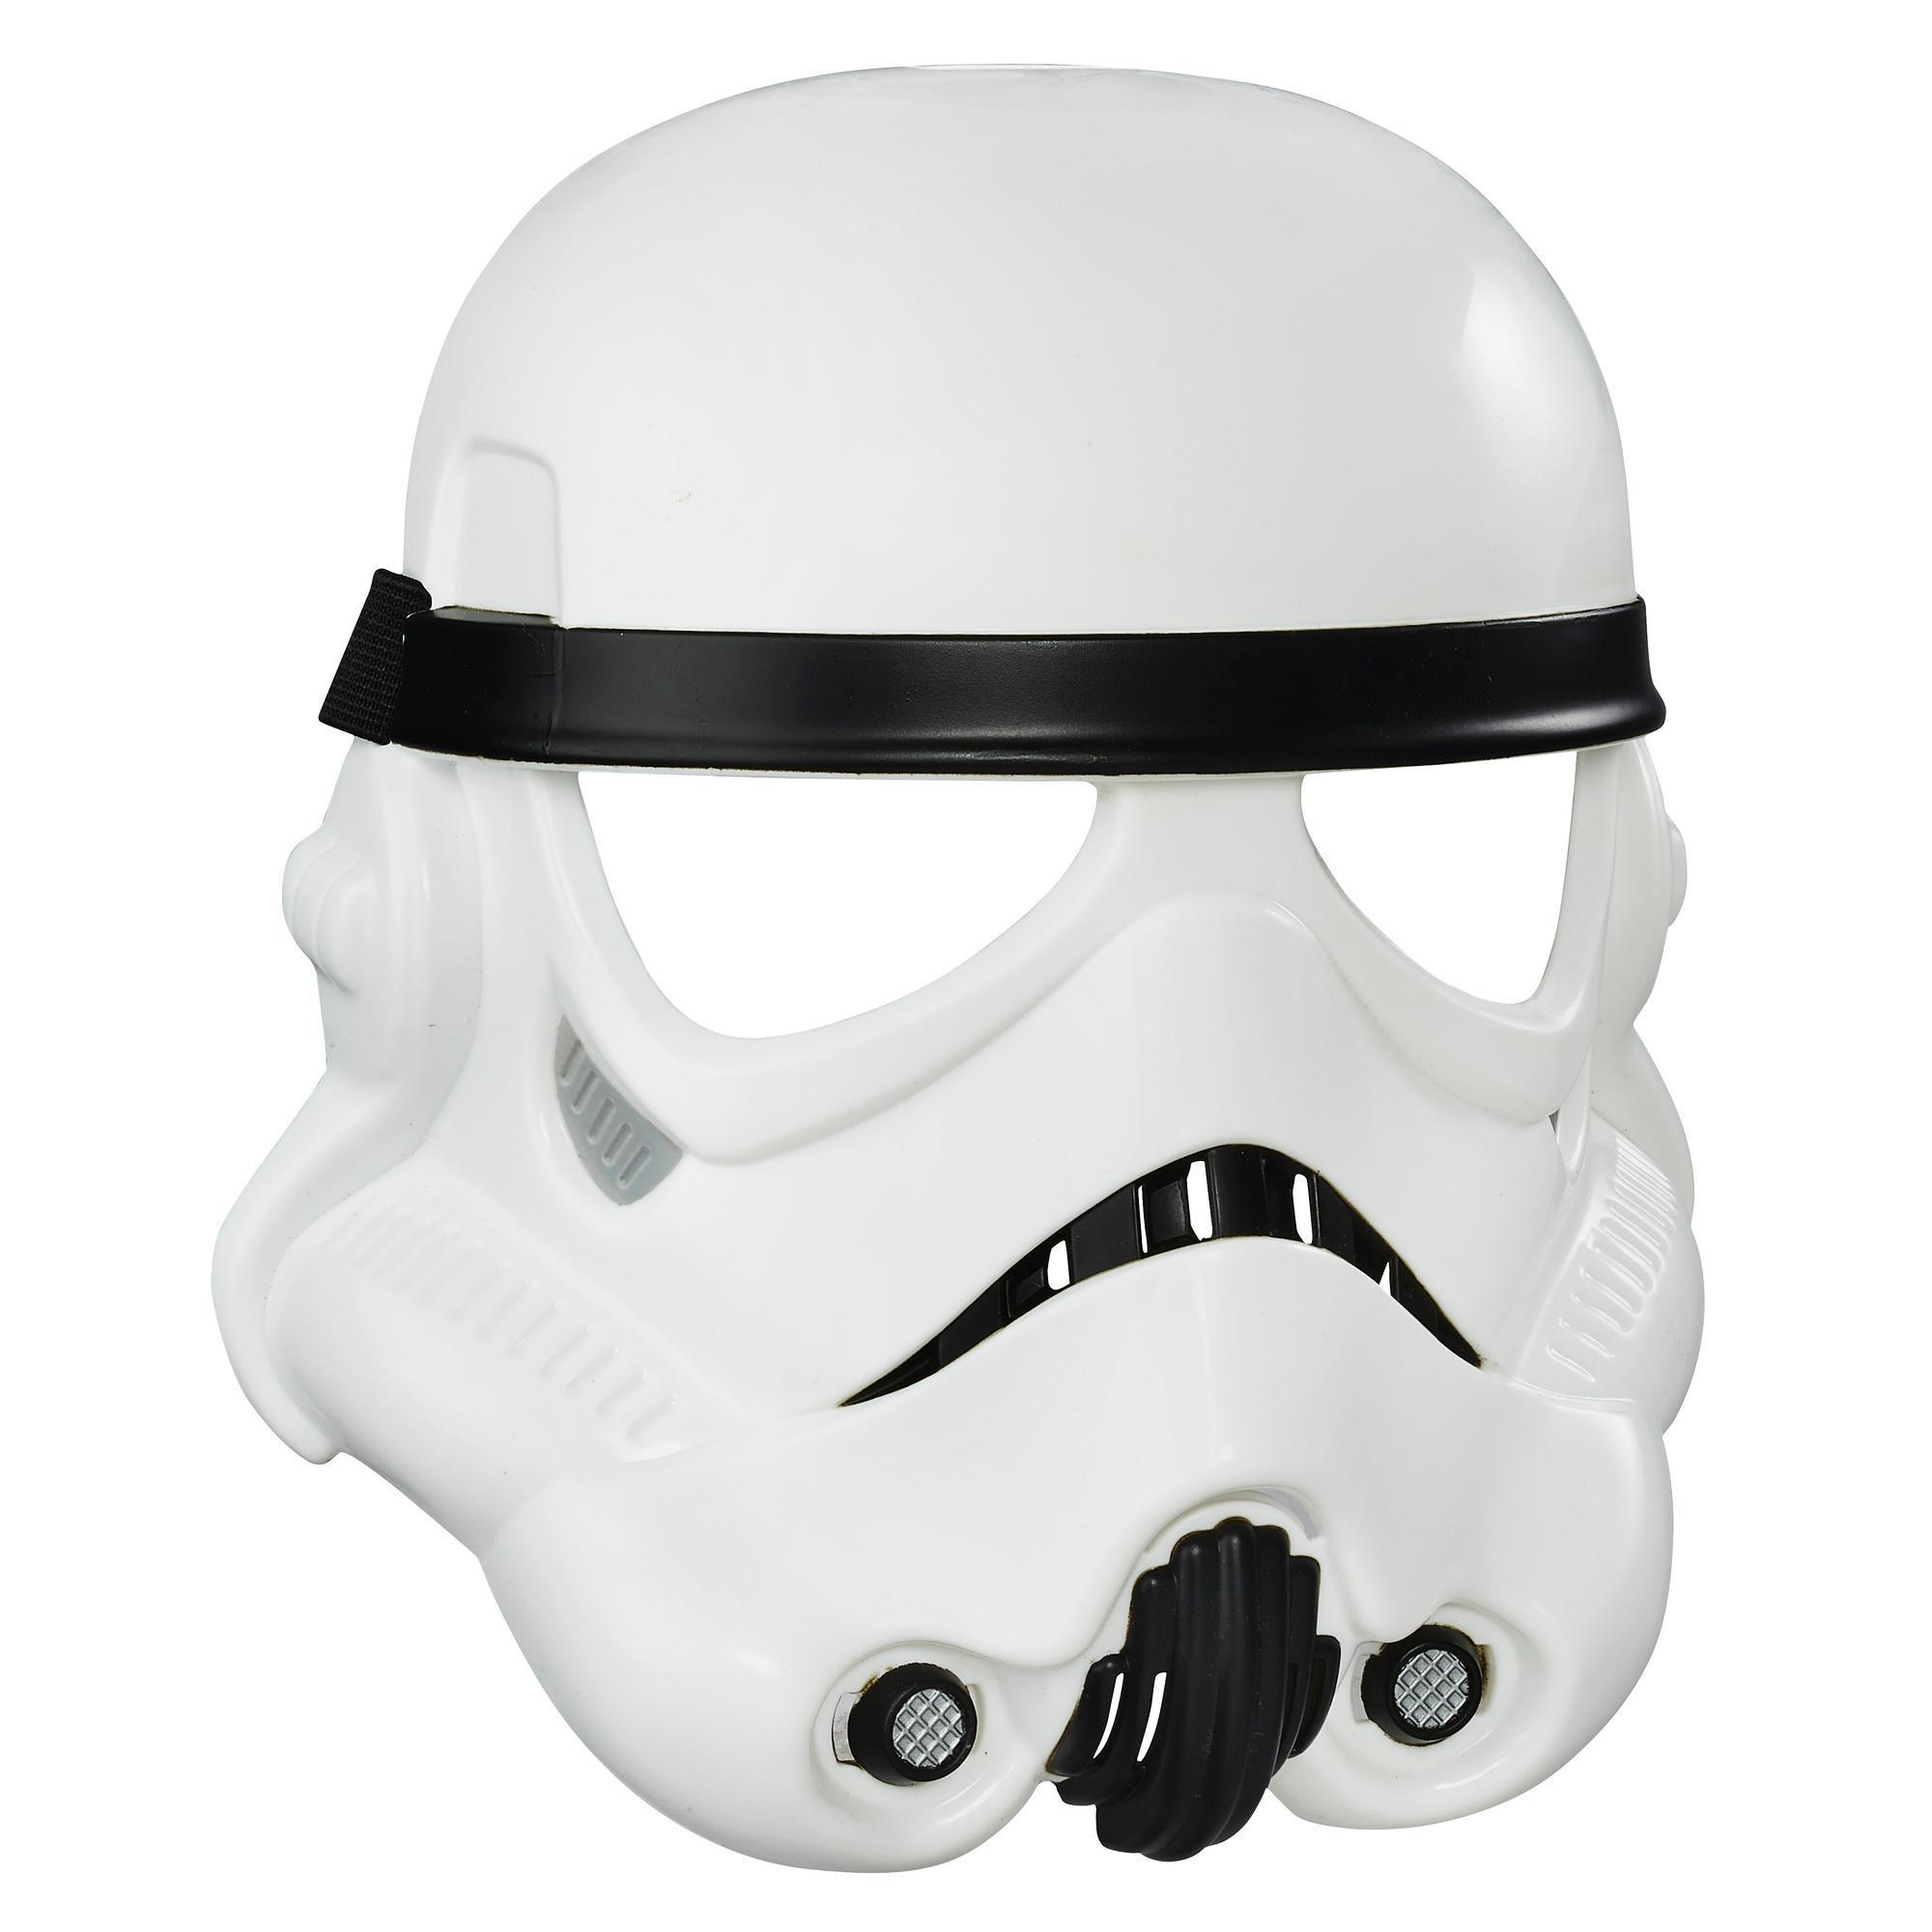 Star Wars R1 Stormtrooper Imperial